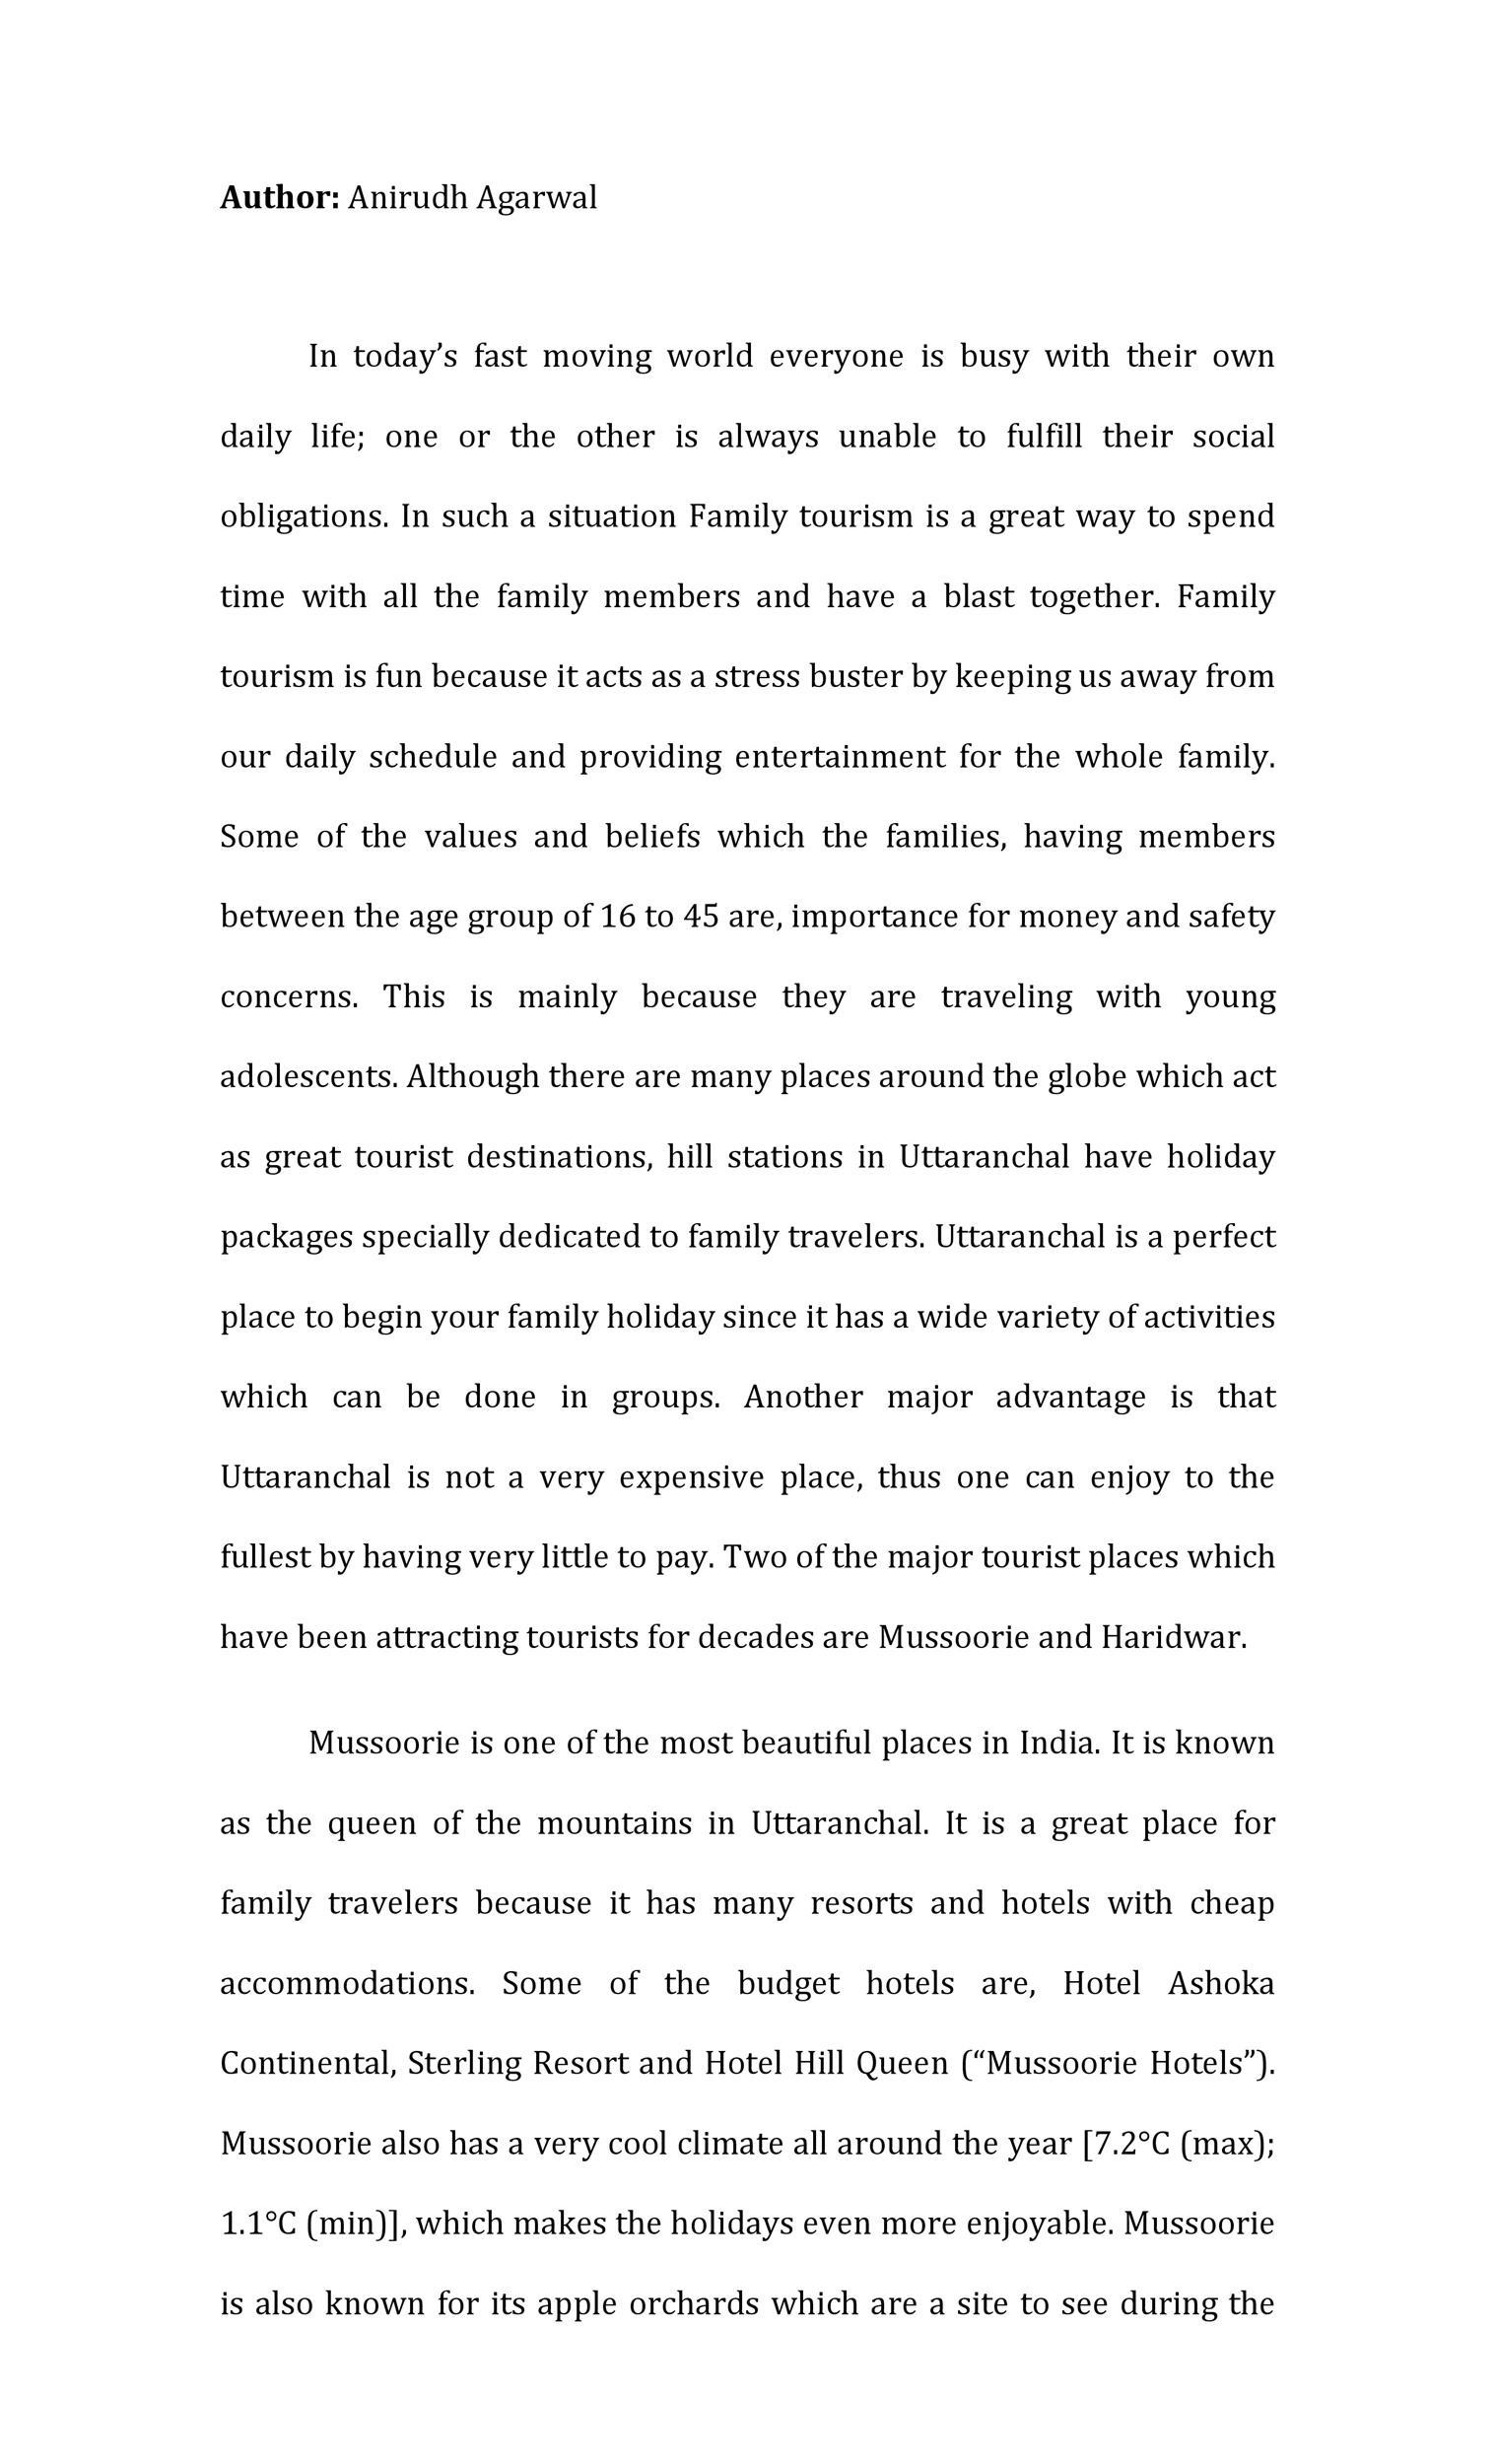 Free persuasive essay example 03